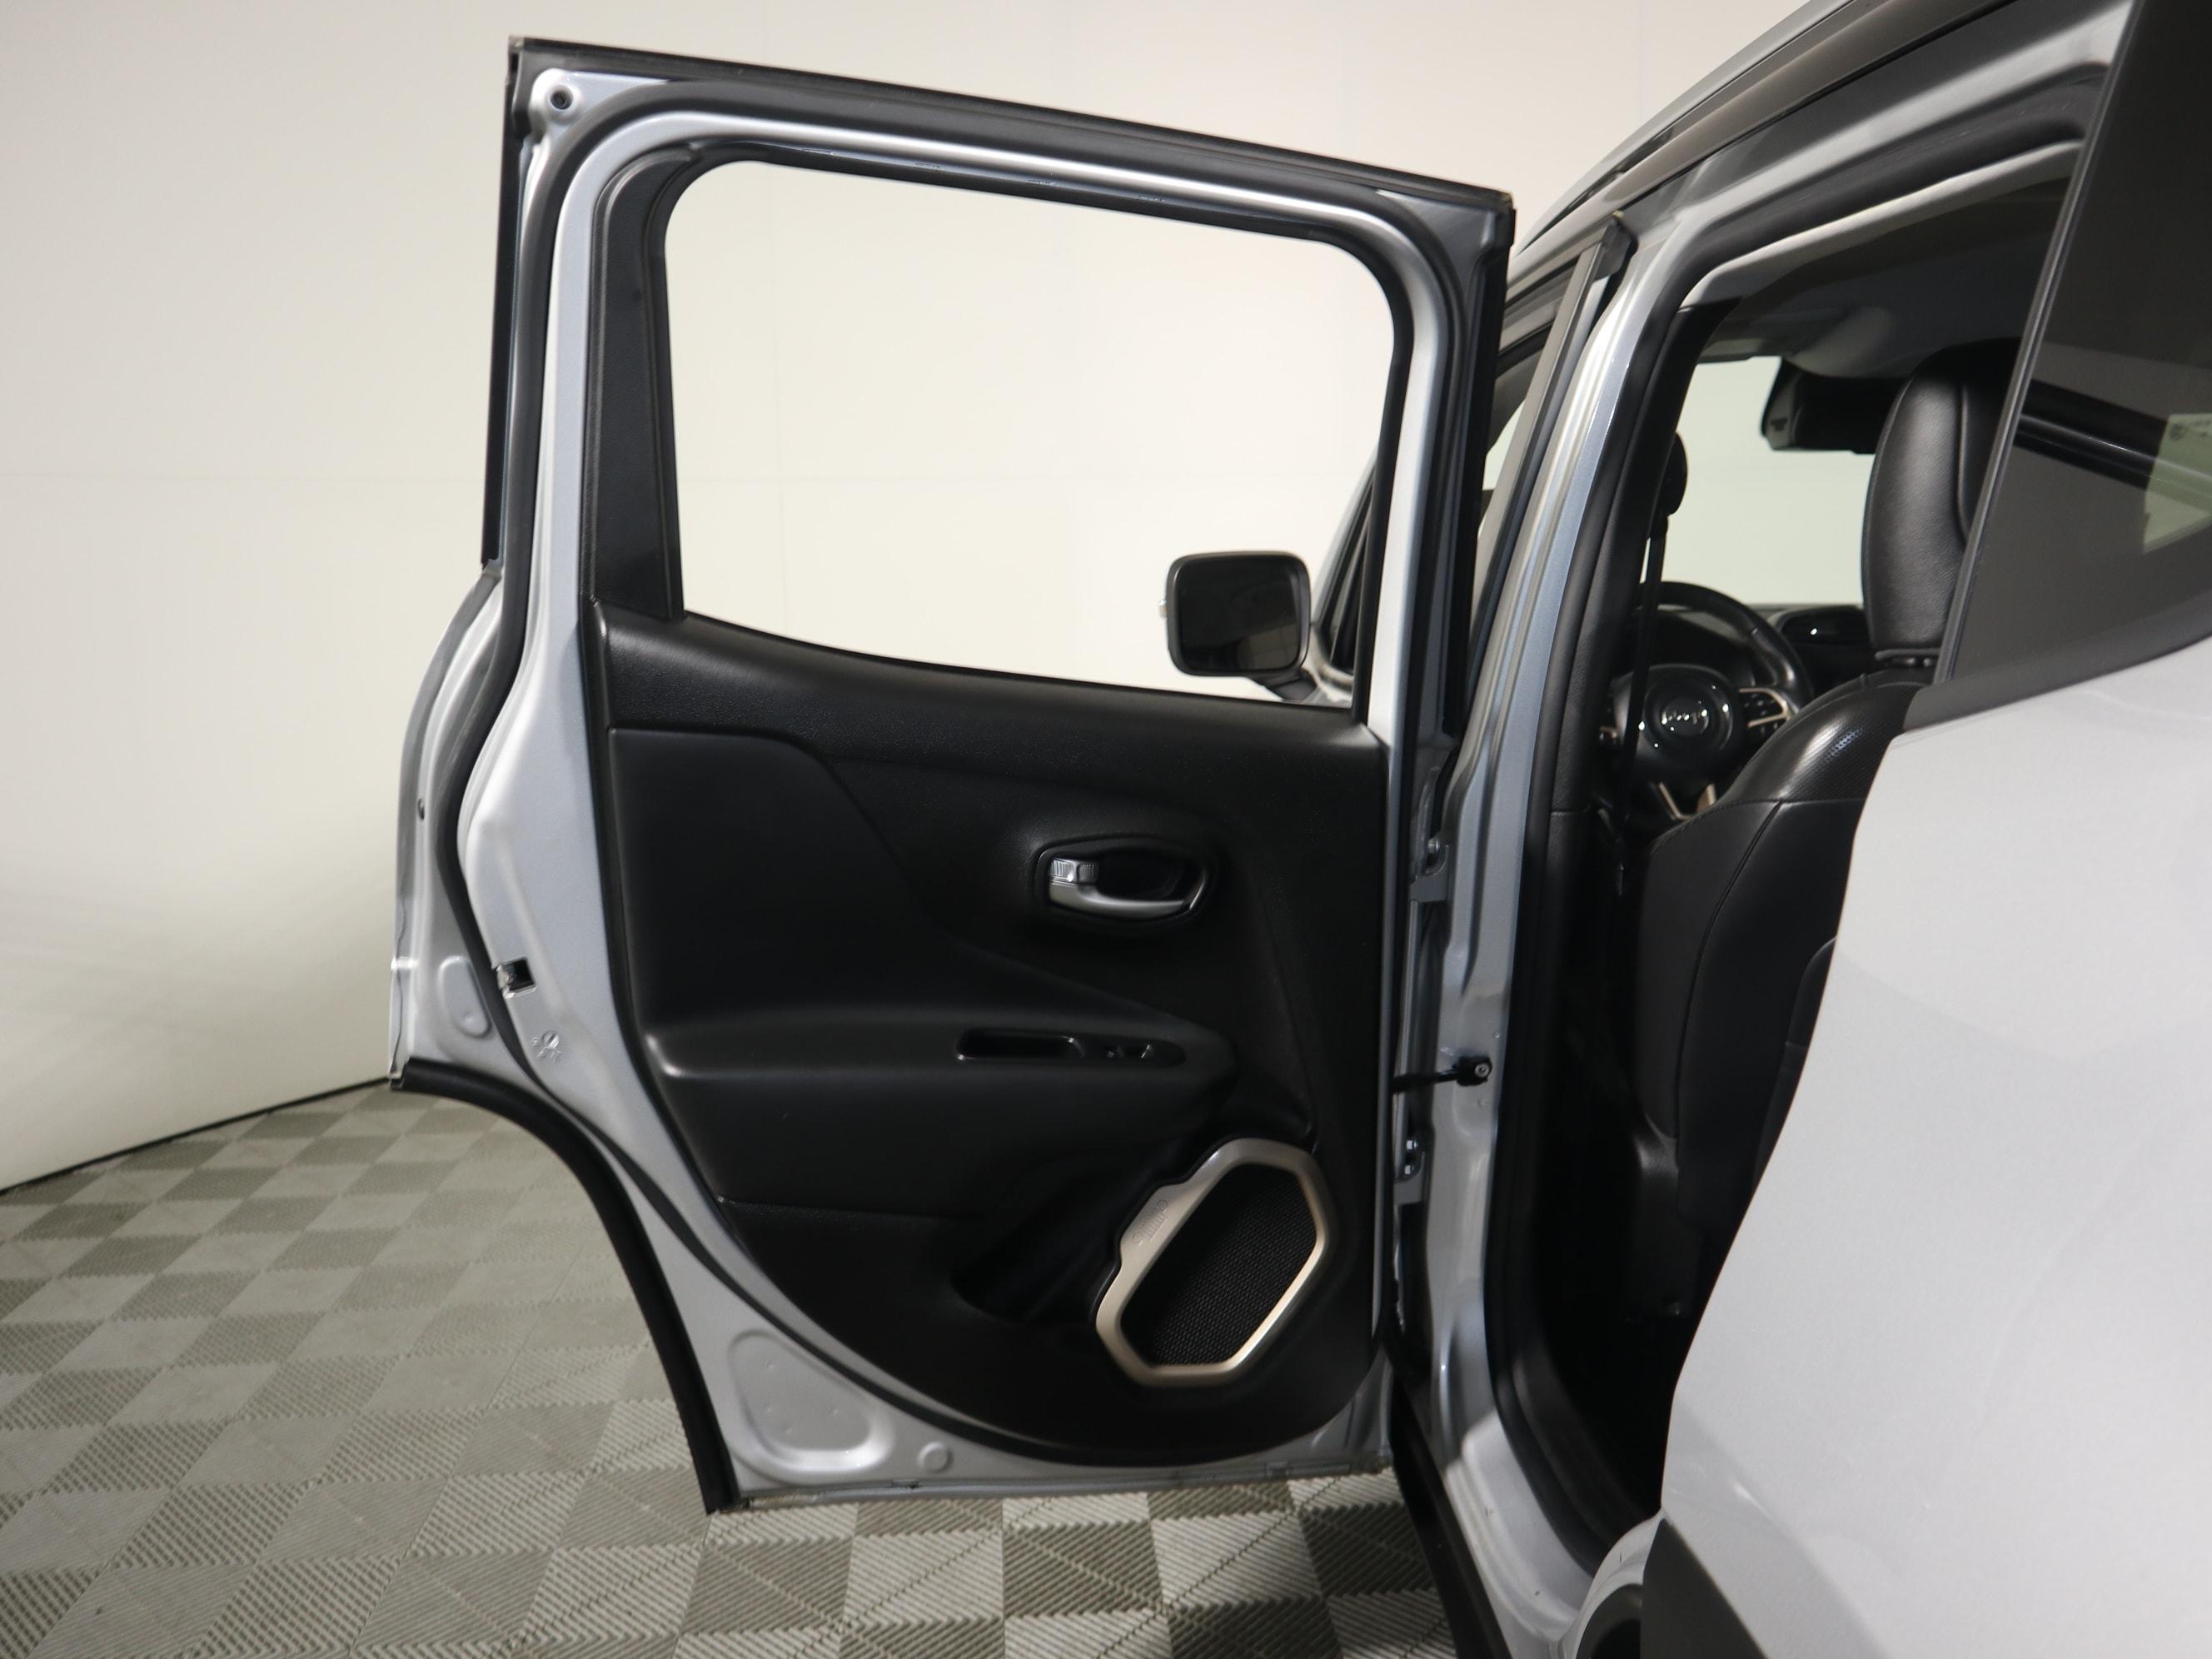 2015 Jeep Renegade - Fair Car Ownership